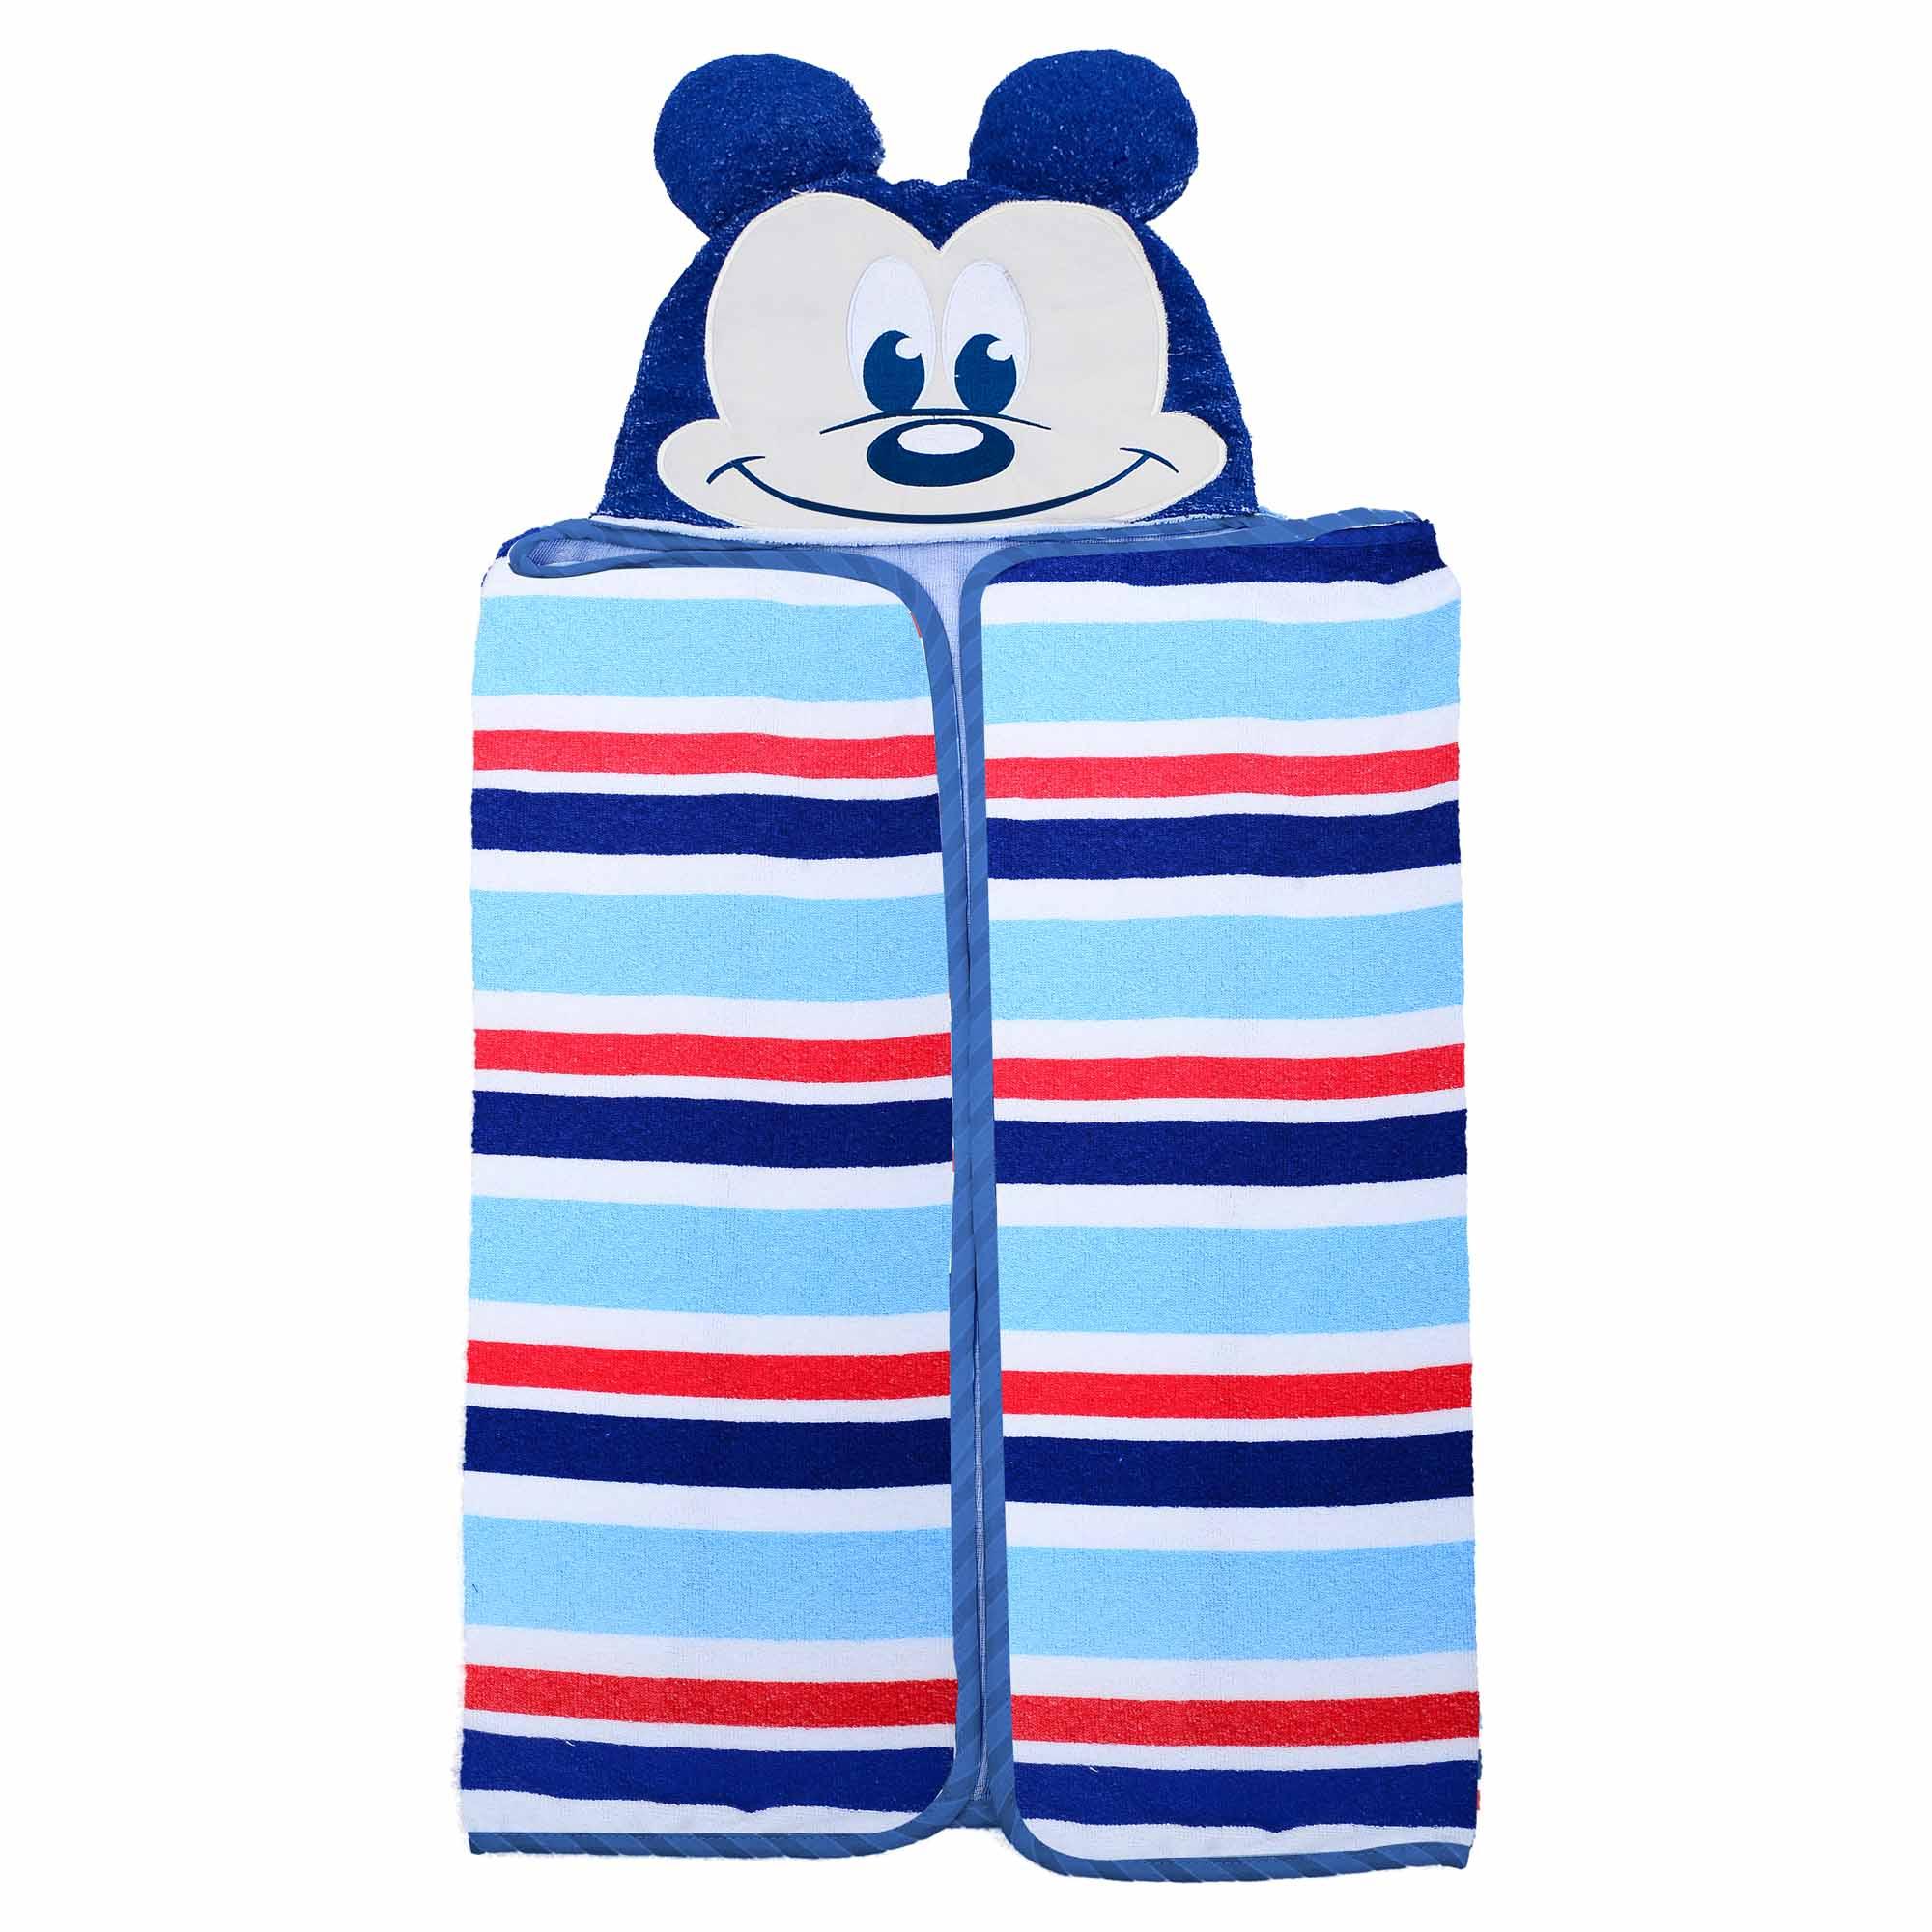 Toalha Minasrey Disney Bordada Com Forro em Fralda - Carinhas Mickey